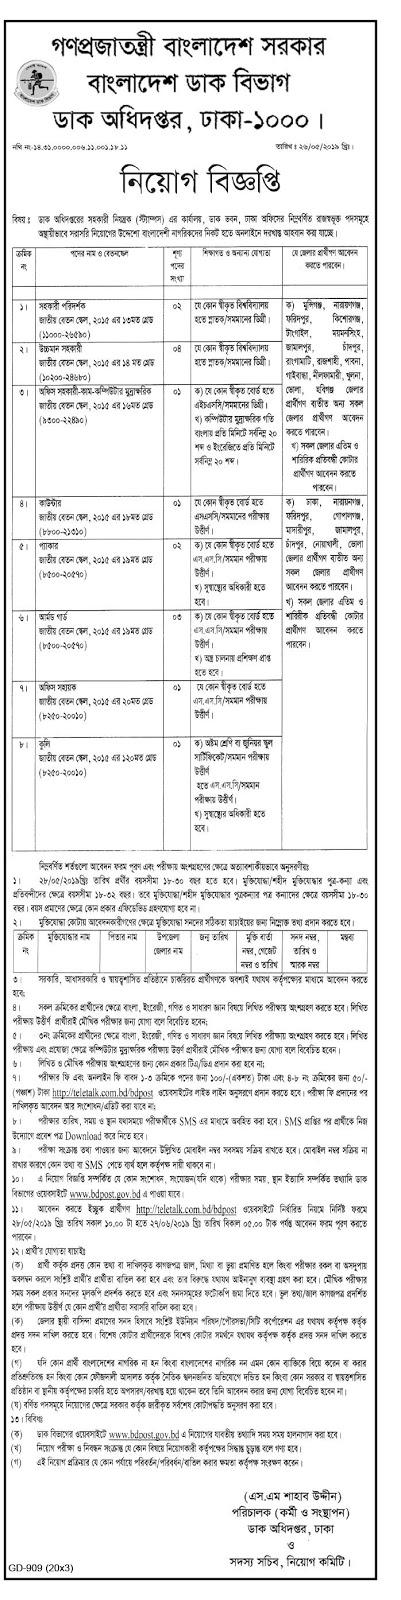 Bangladesh Post Office Job Circular 2019